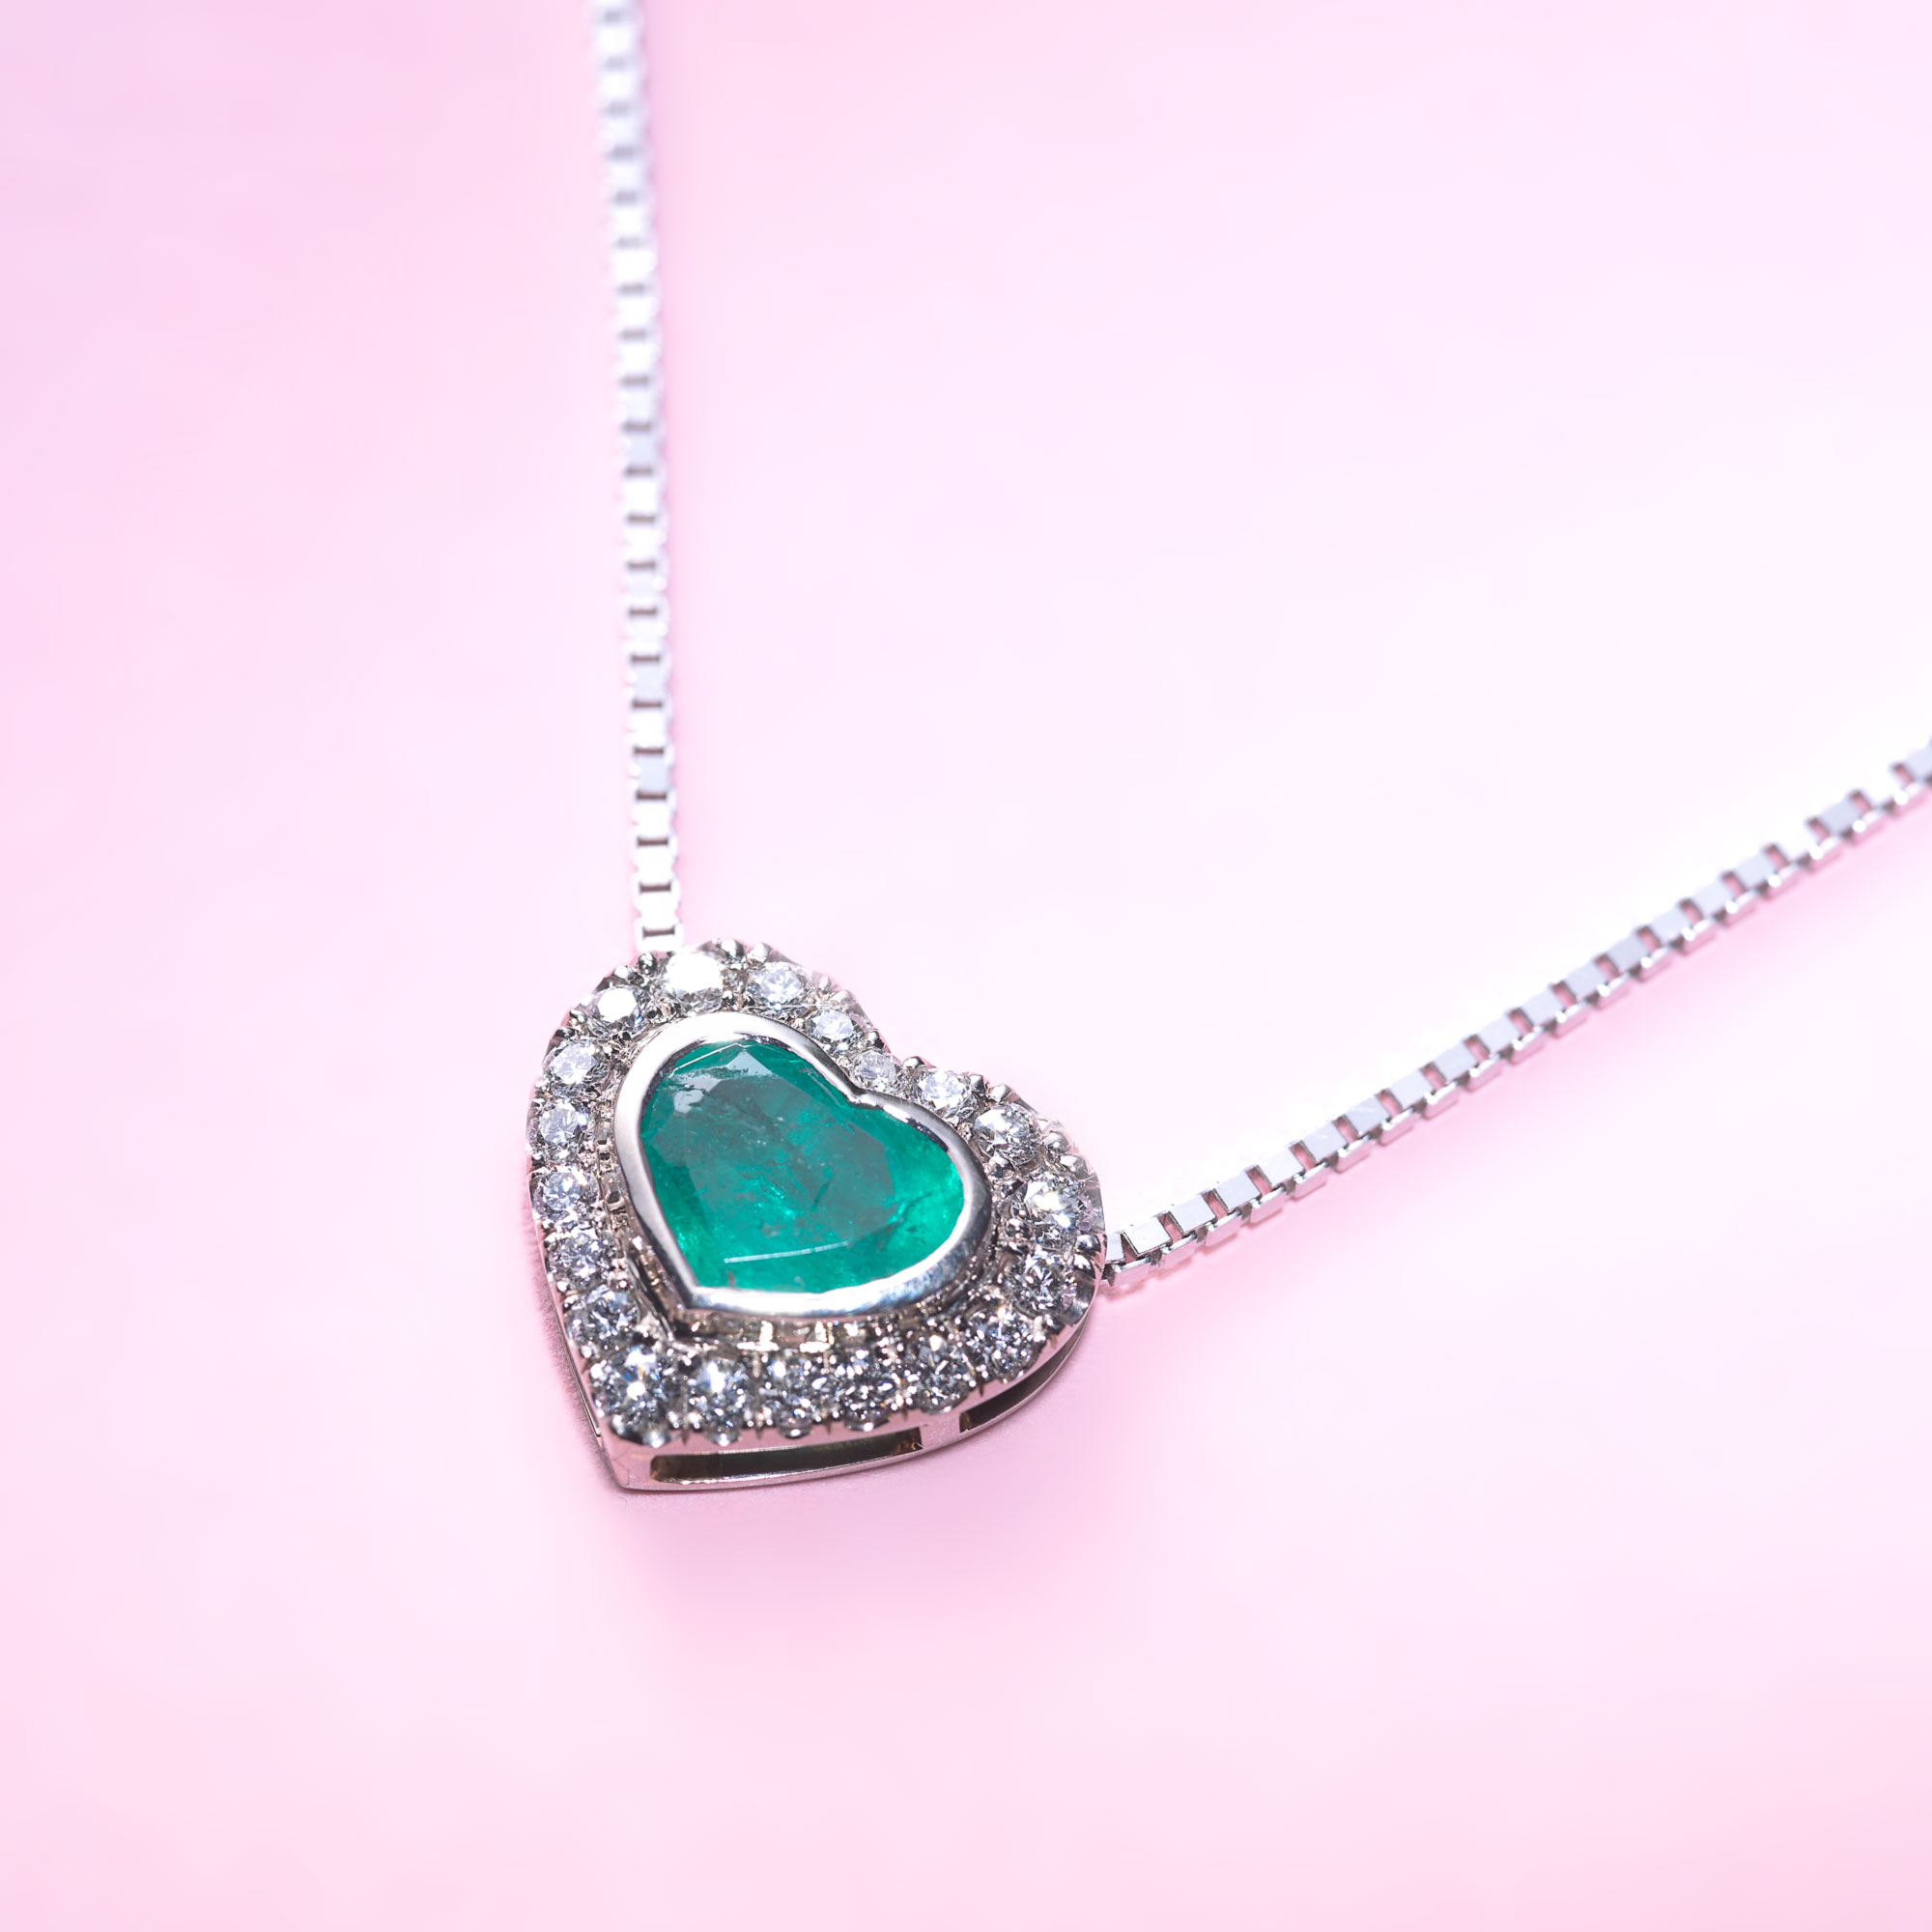 Halsband med Smaragdhjärta 3feaf0e42a5b4